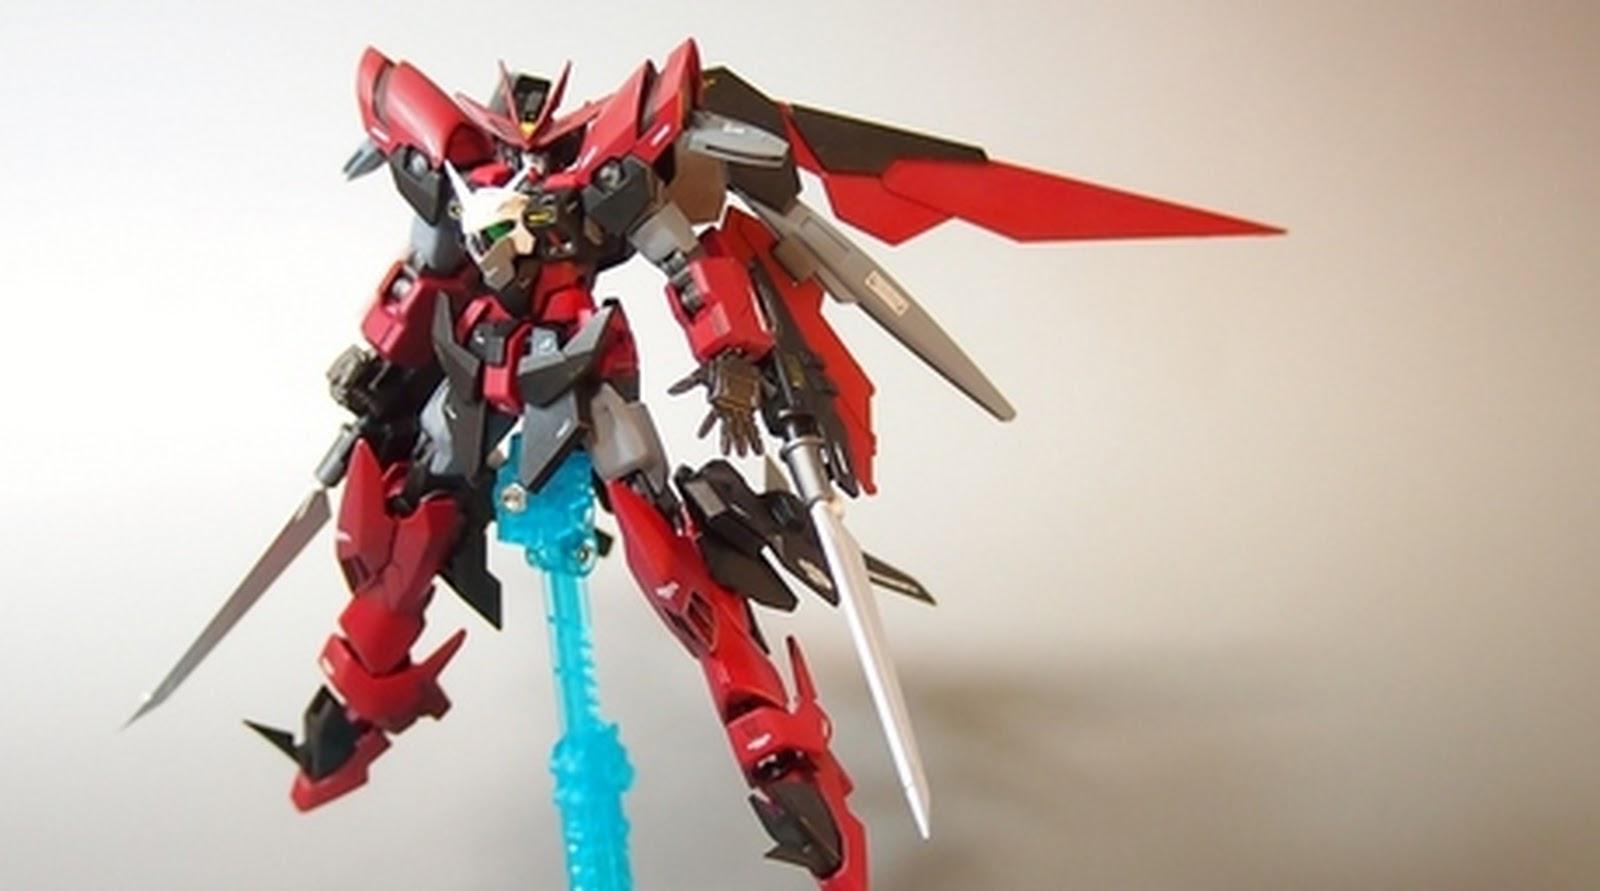 Custom Build: 1/144 Epyon ARES - Gundam Kits Collection News and Reviews